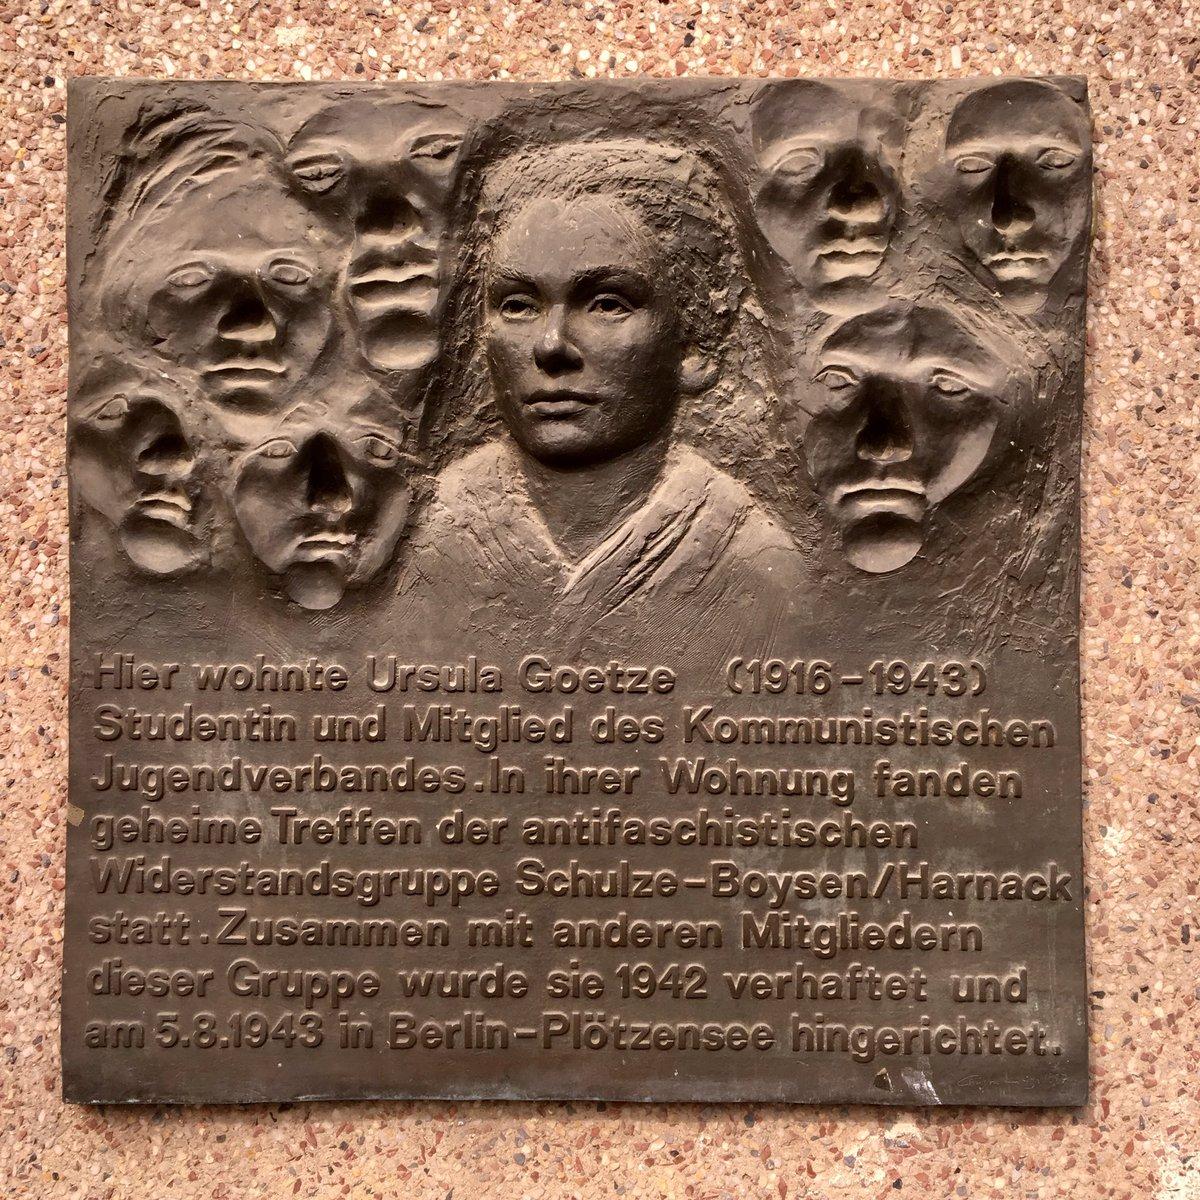 Ursula Goetze (1918-1943) communist militant executed by the nazis. #UrbanSkin #UrbanMemories #Kreuzberg #Hornstraße https://t.co/gRk8DZAp9o